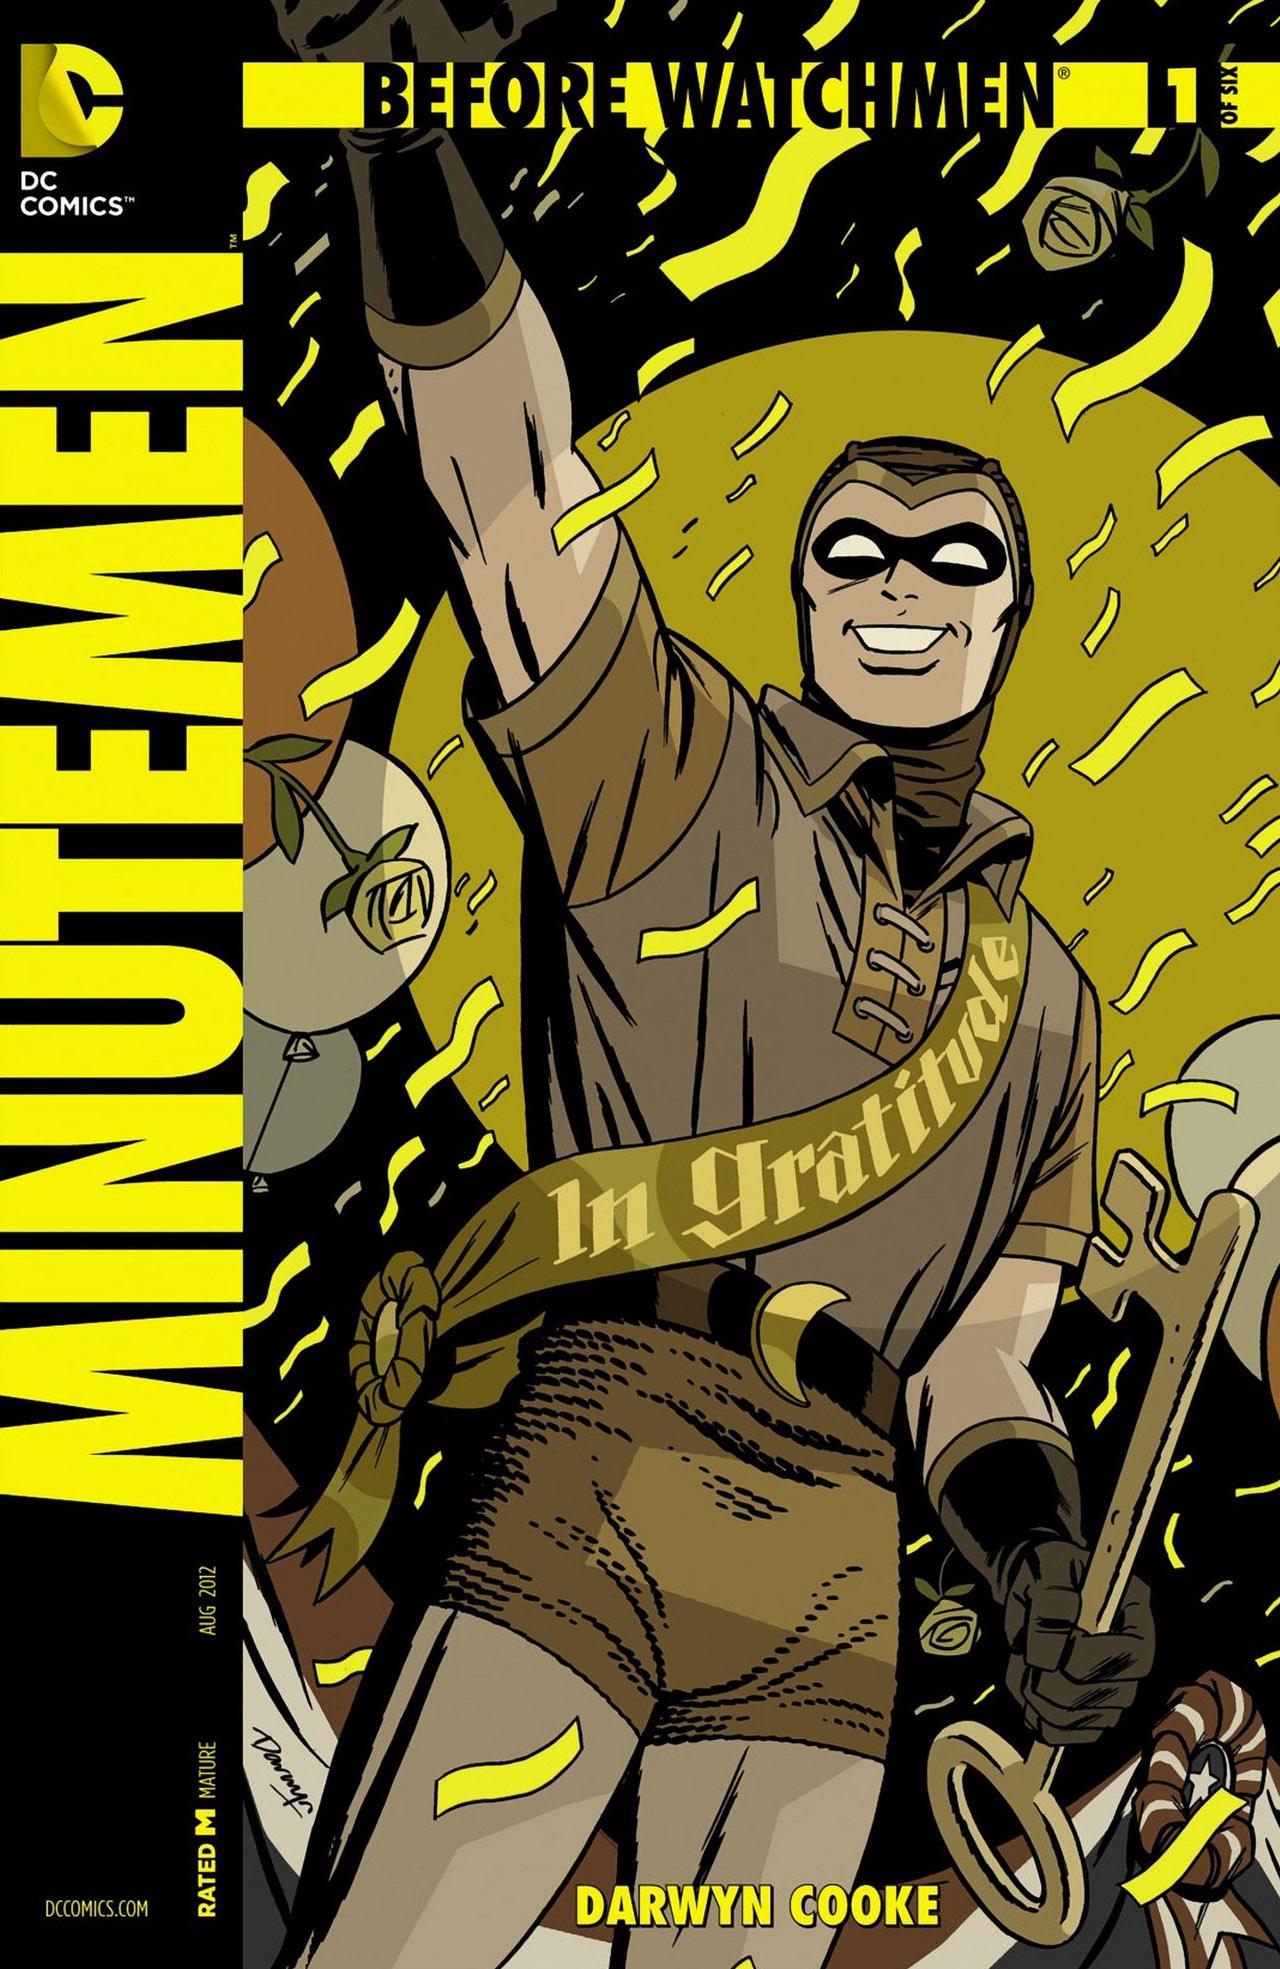 Photo of Minutemen #1 e Before Watchmen se inicia!